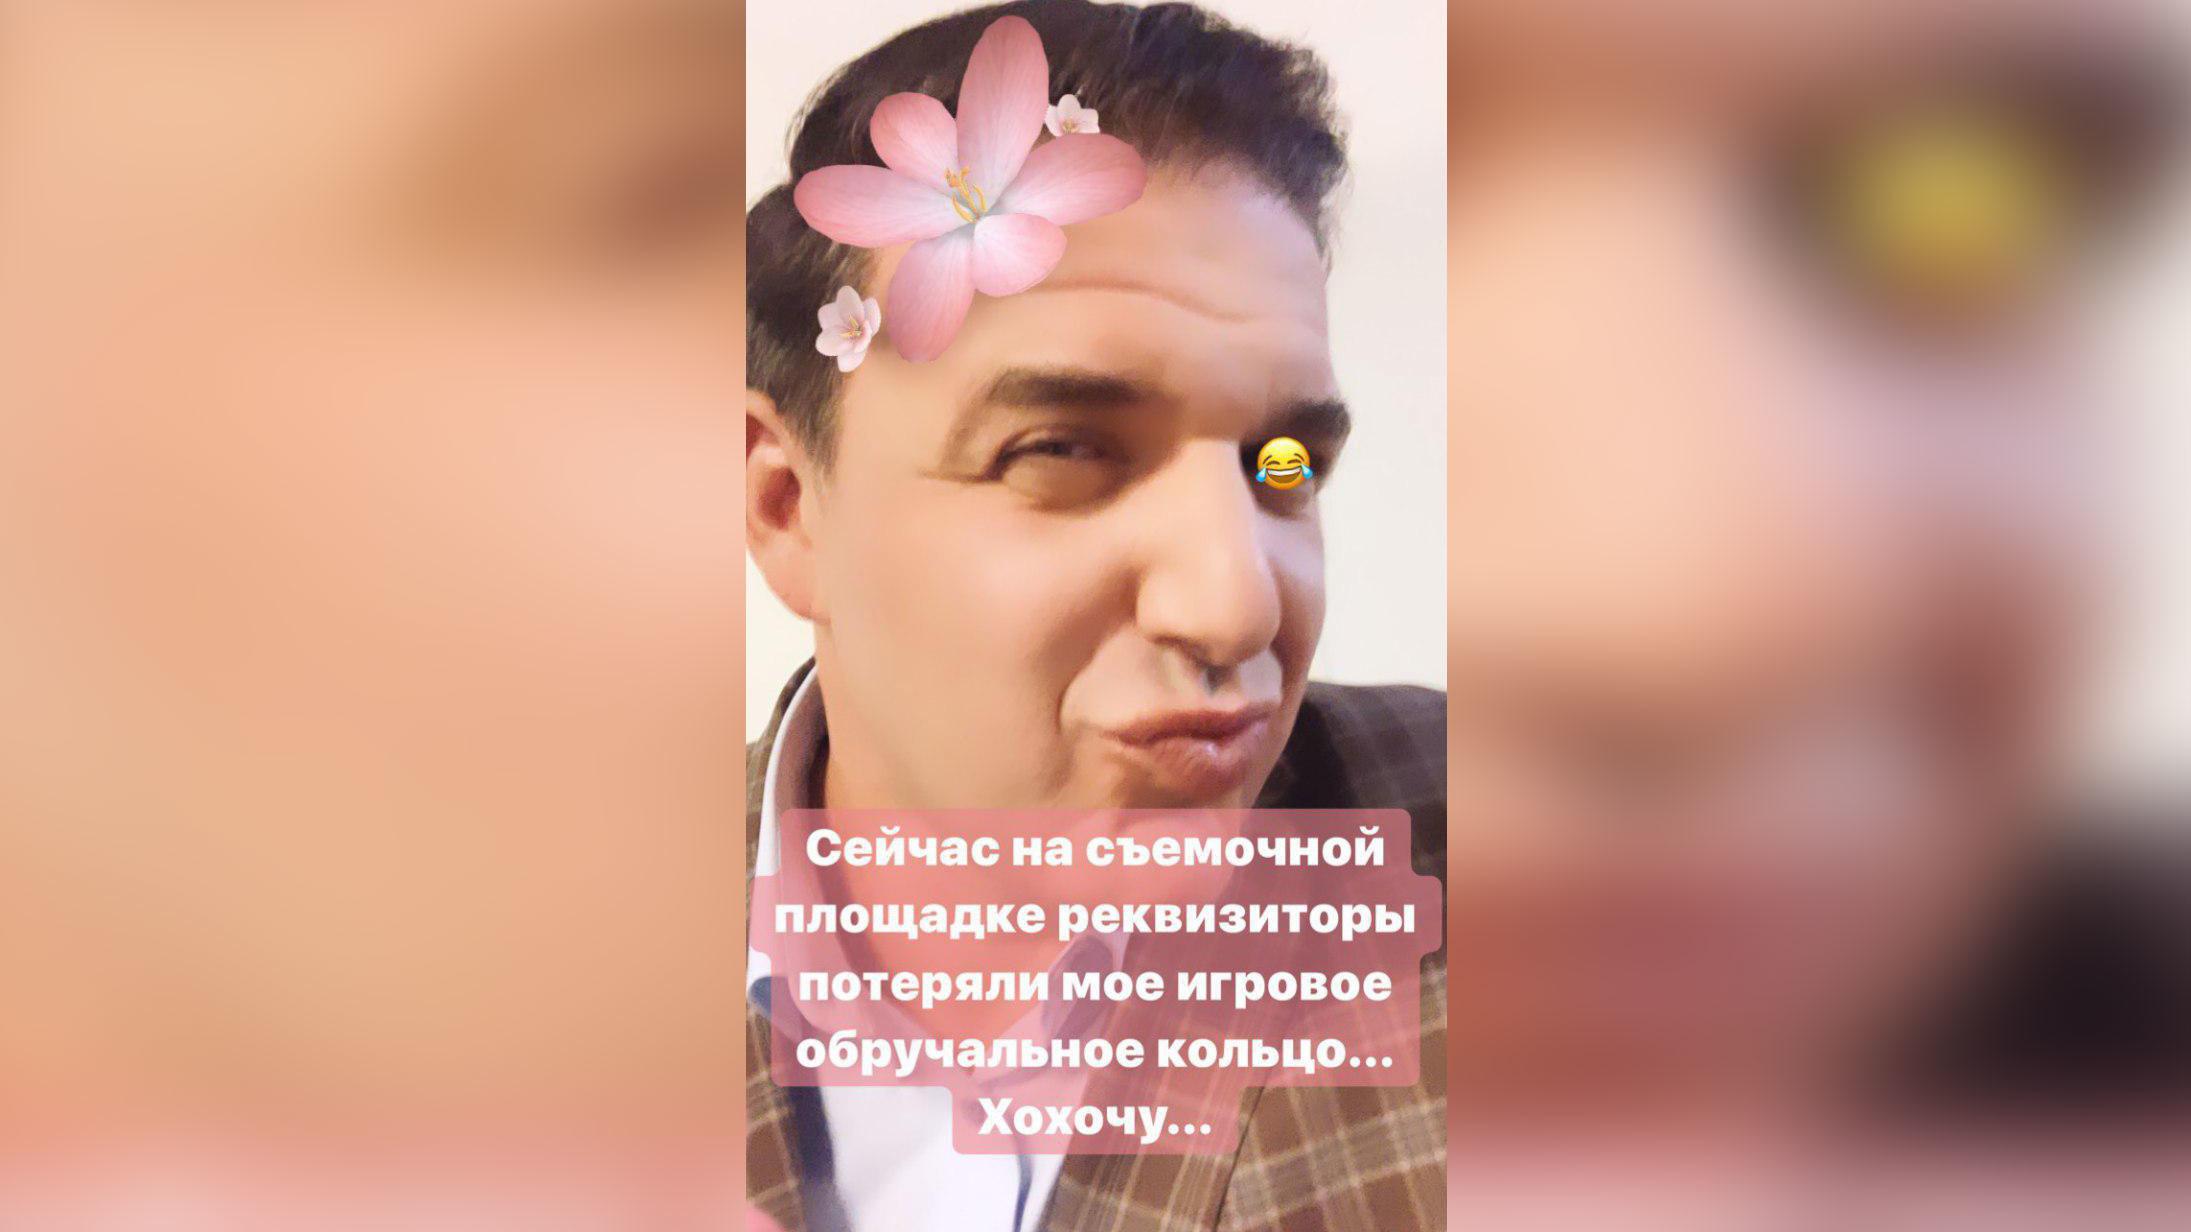 "<p>Фото © instagram.com/stories/<a href=""https://www.instagram.com/stories/mvitorgan/?hl=ru"" target=""_self"">mvitorgan</a></p>"